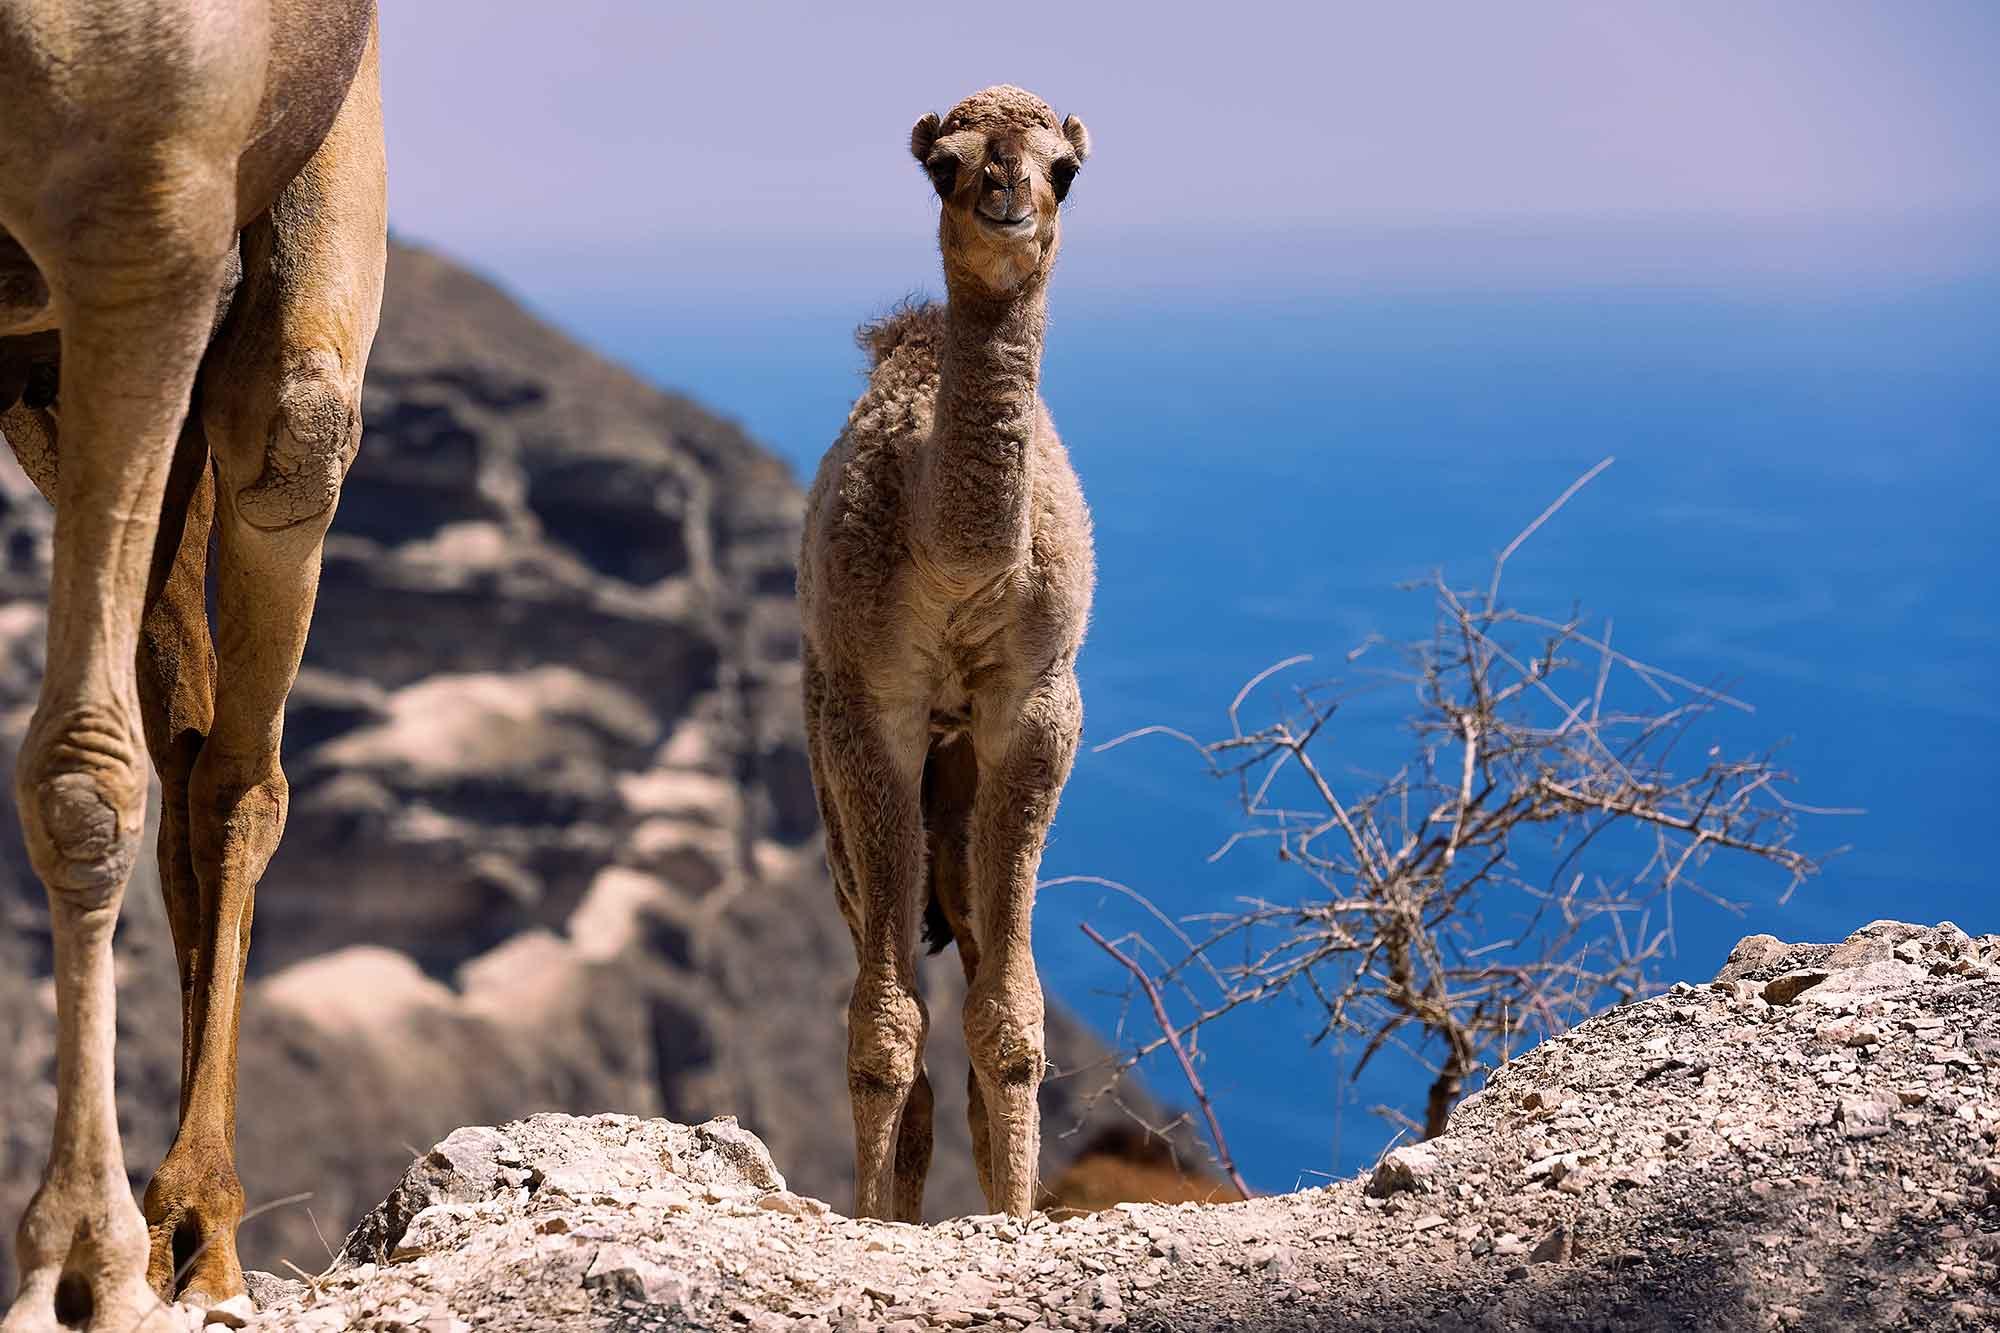 Camels west of Salalah. © Ulli Maier & Nisa Maier